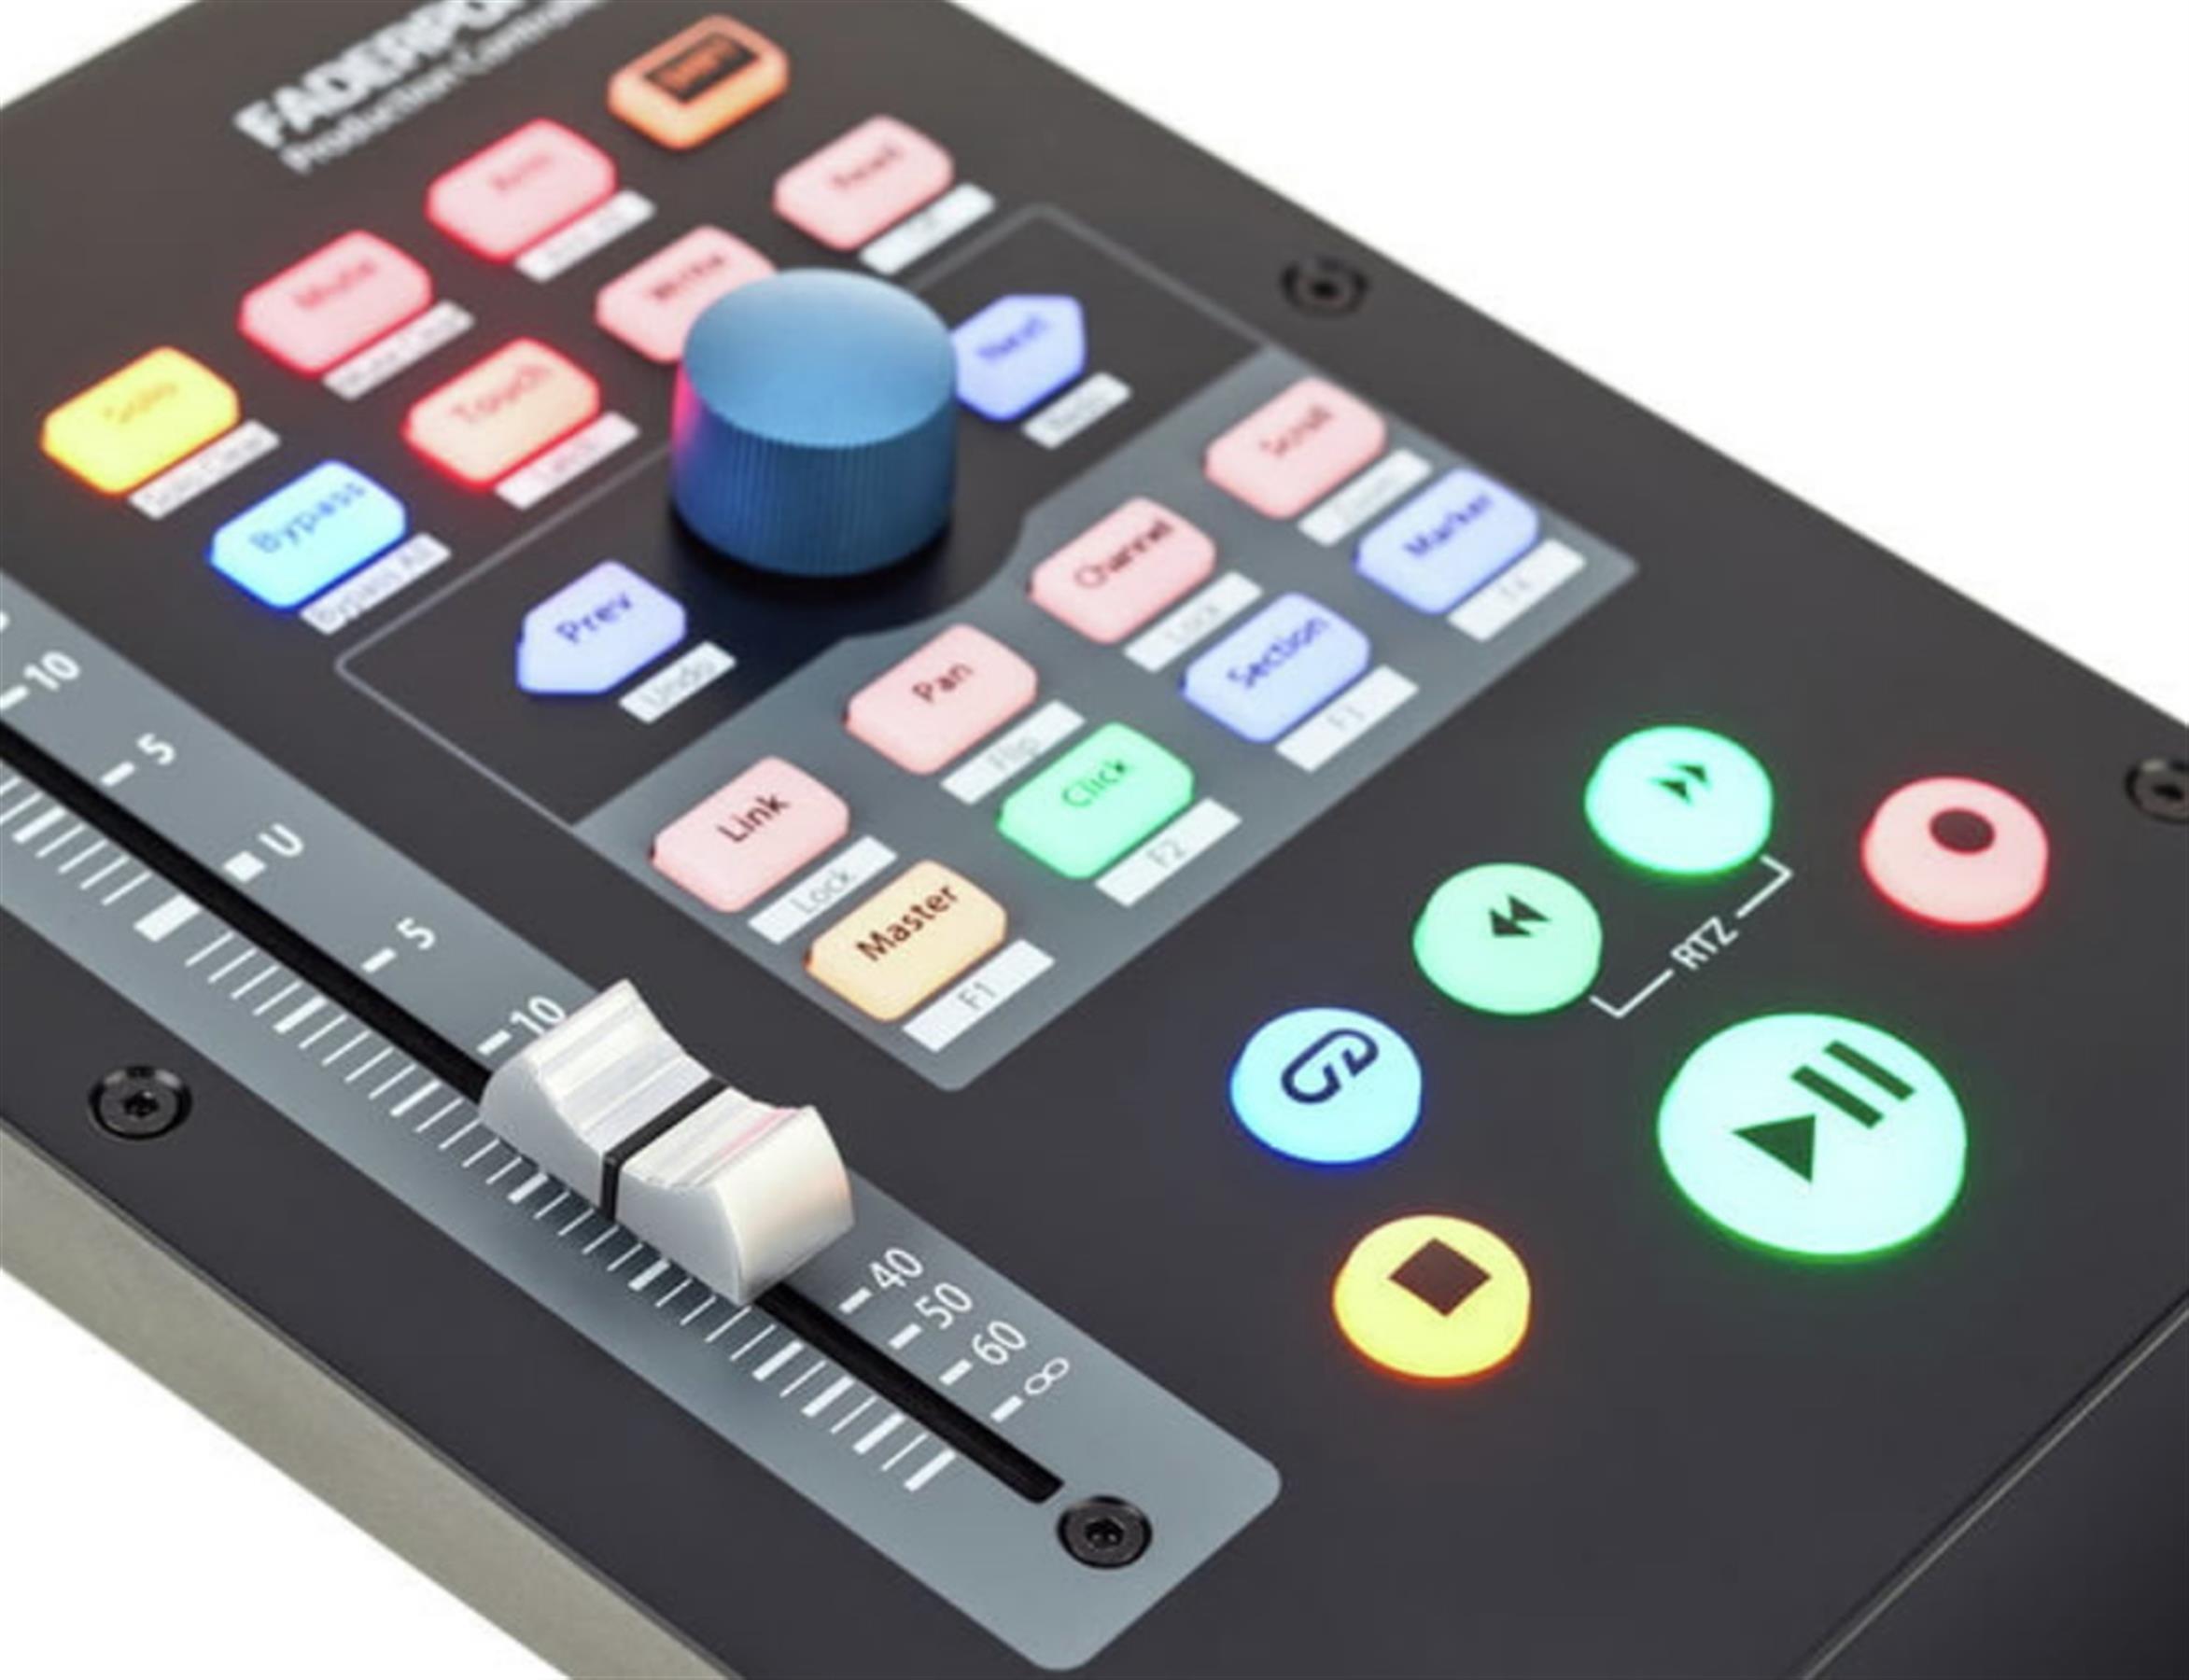 PRESONUS FADERPORT V2 CONTROLLER | Dampi.it